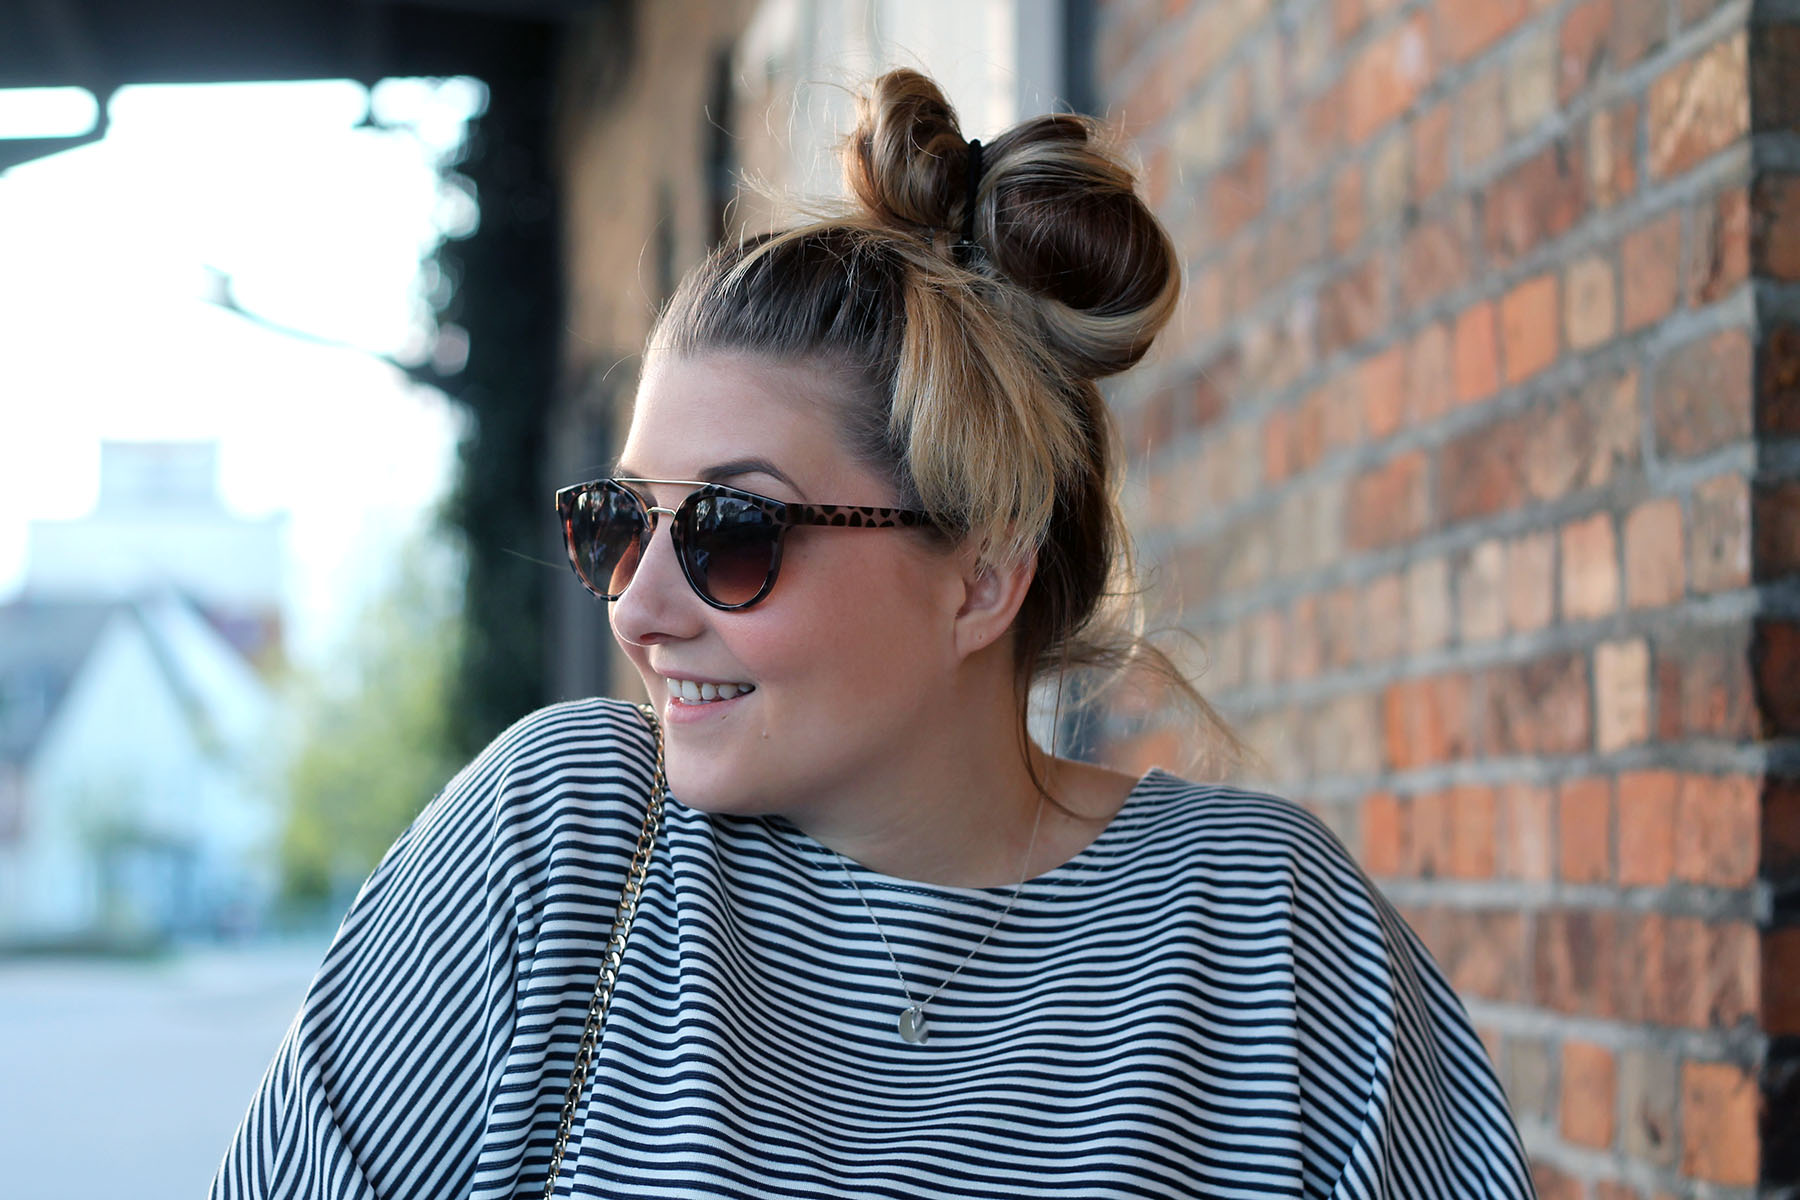 outfit-modeblog-fashionblog-sonnenbrille-dutt-haare-inspiration